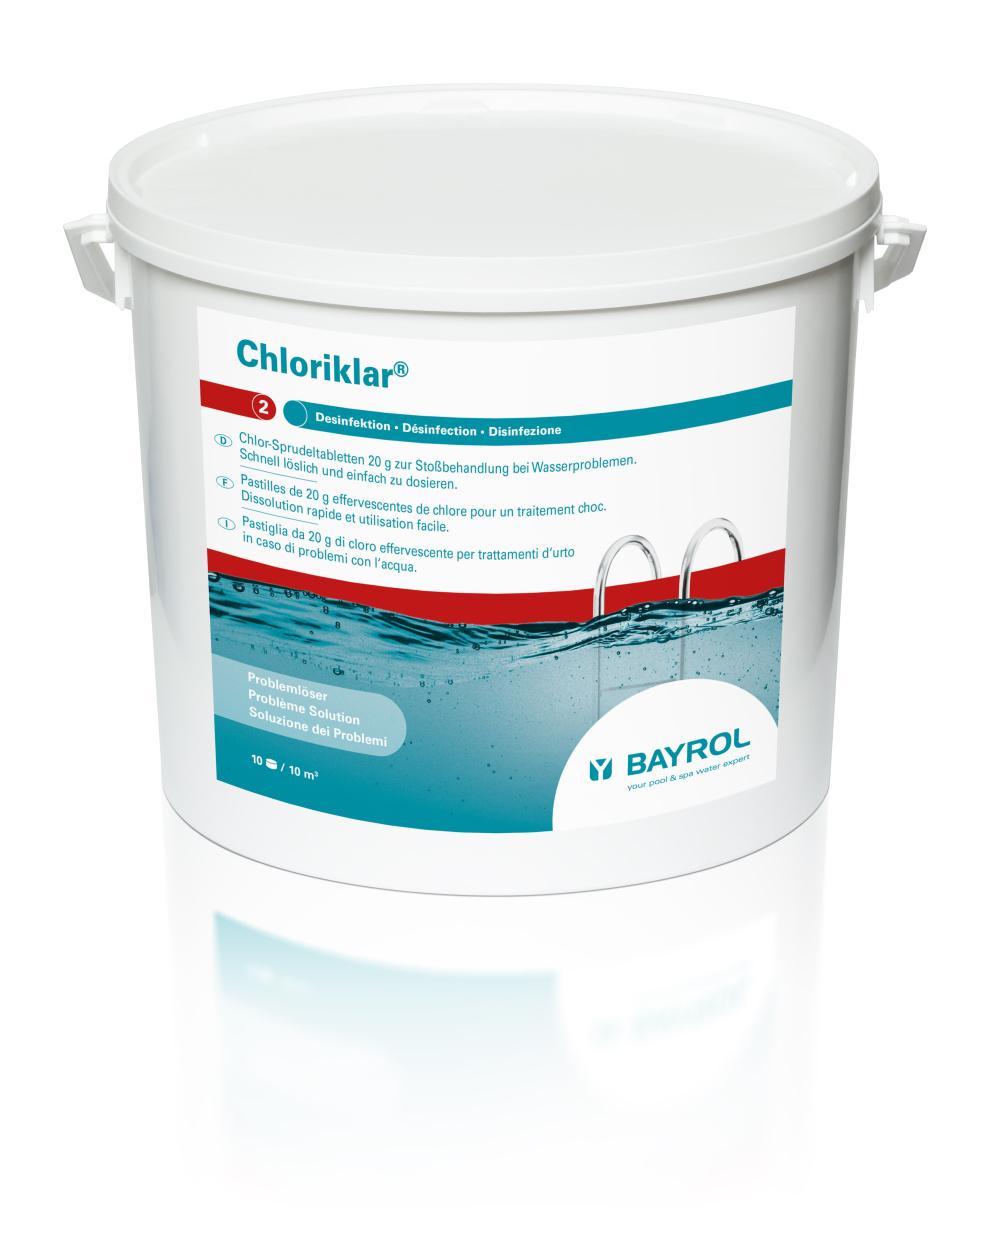 Chloriklar Chlor Sprudeltabletten 10Kg, 20g zur Stoßchlorung